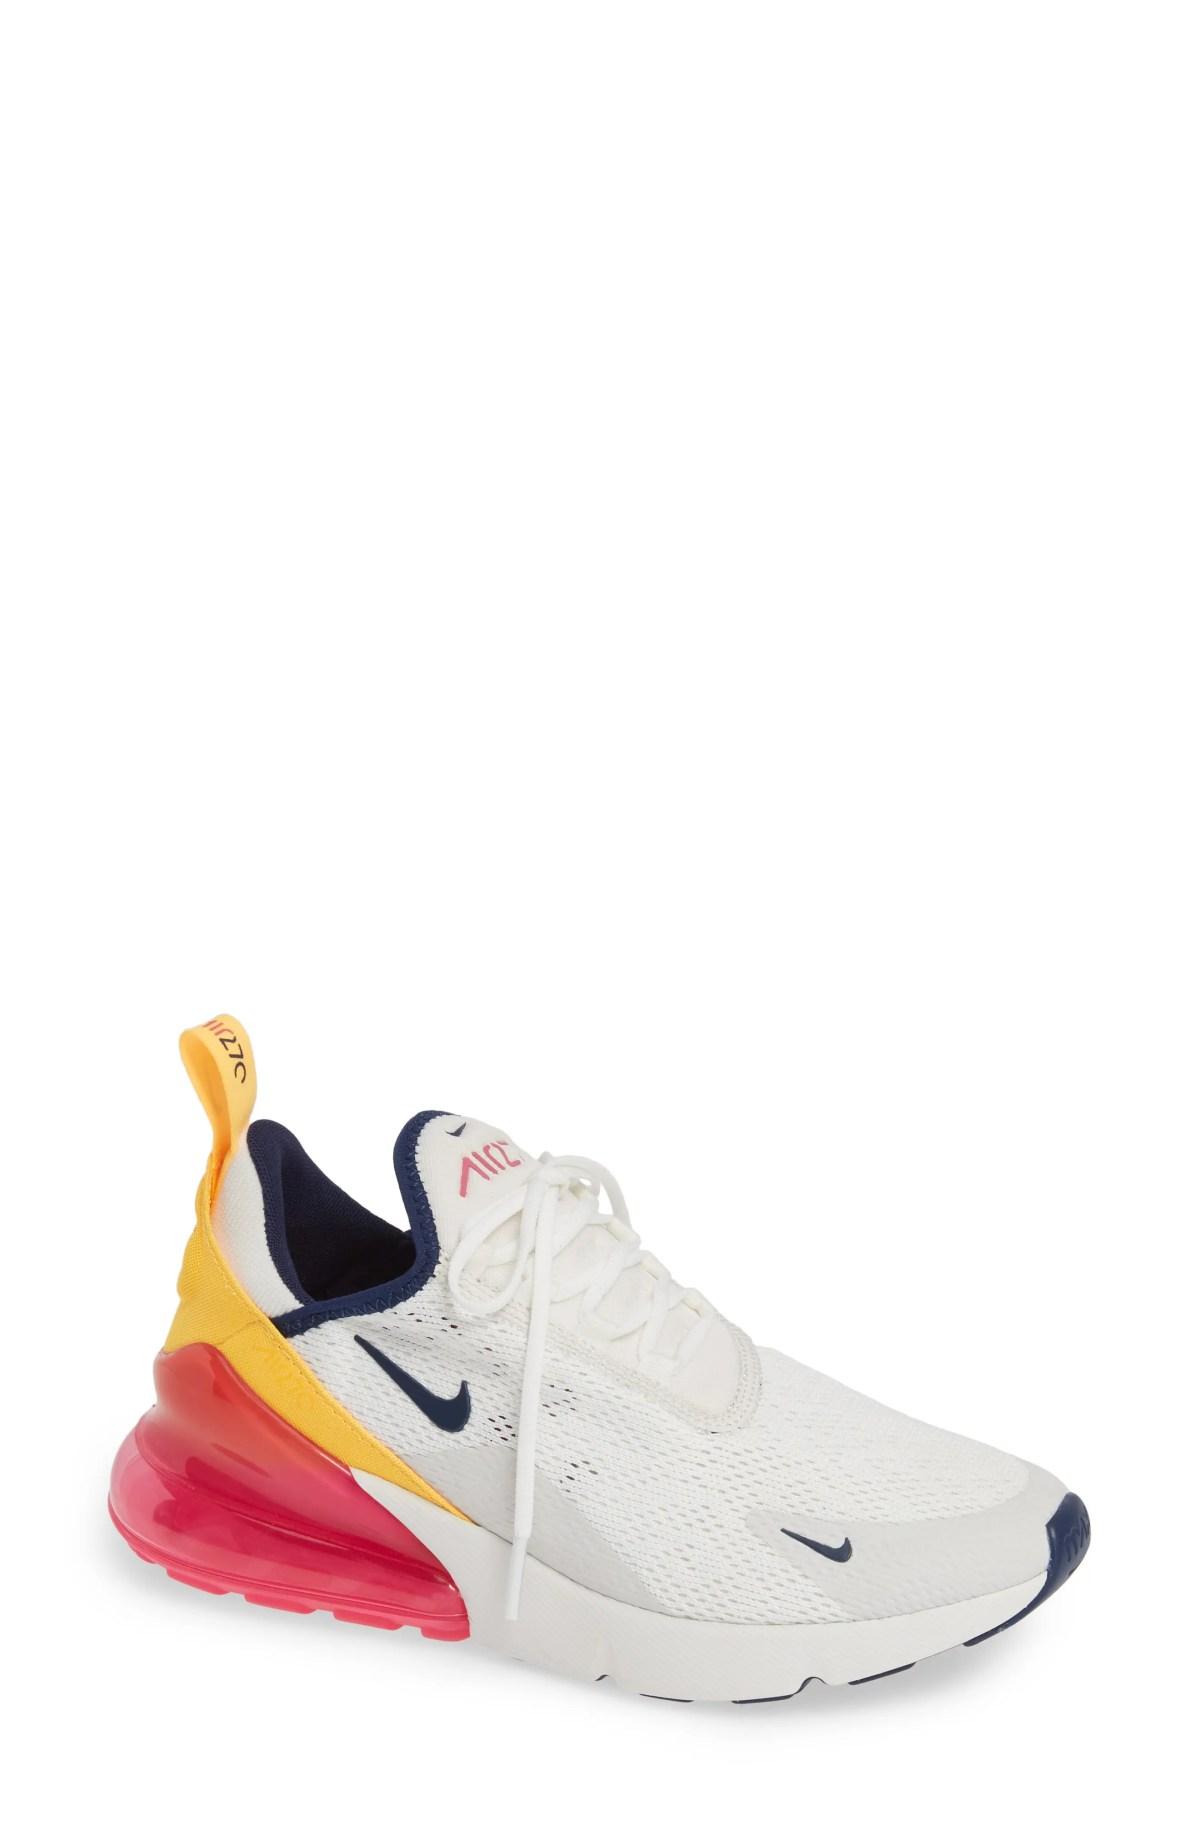 NIKE Air Max 270 Premium Sneaker, Main, color, WHITE/ NAVY/ LASER FUCHSIA